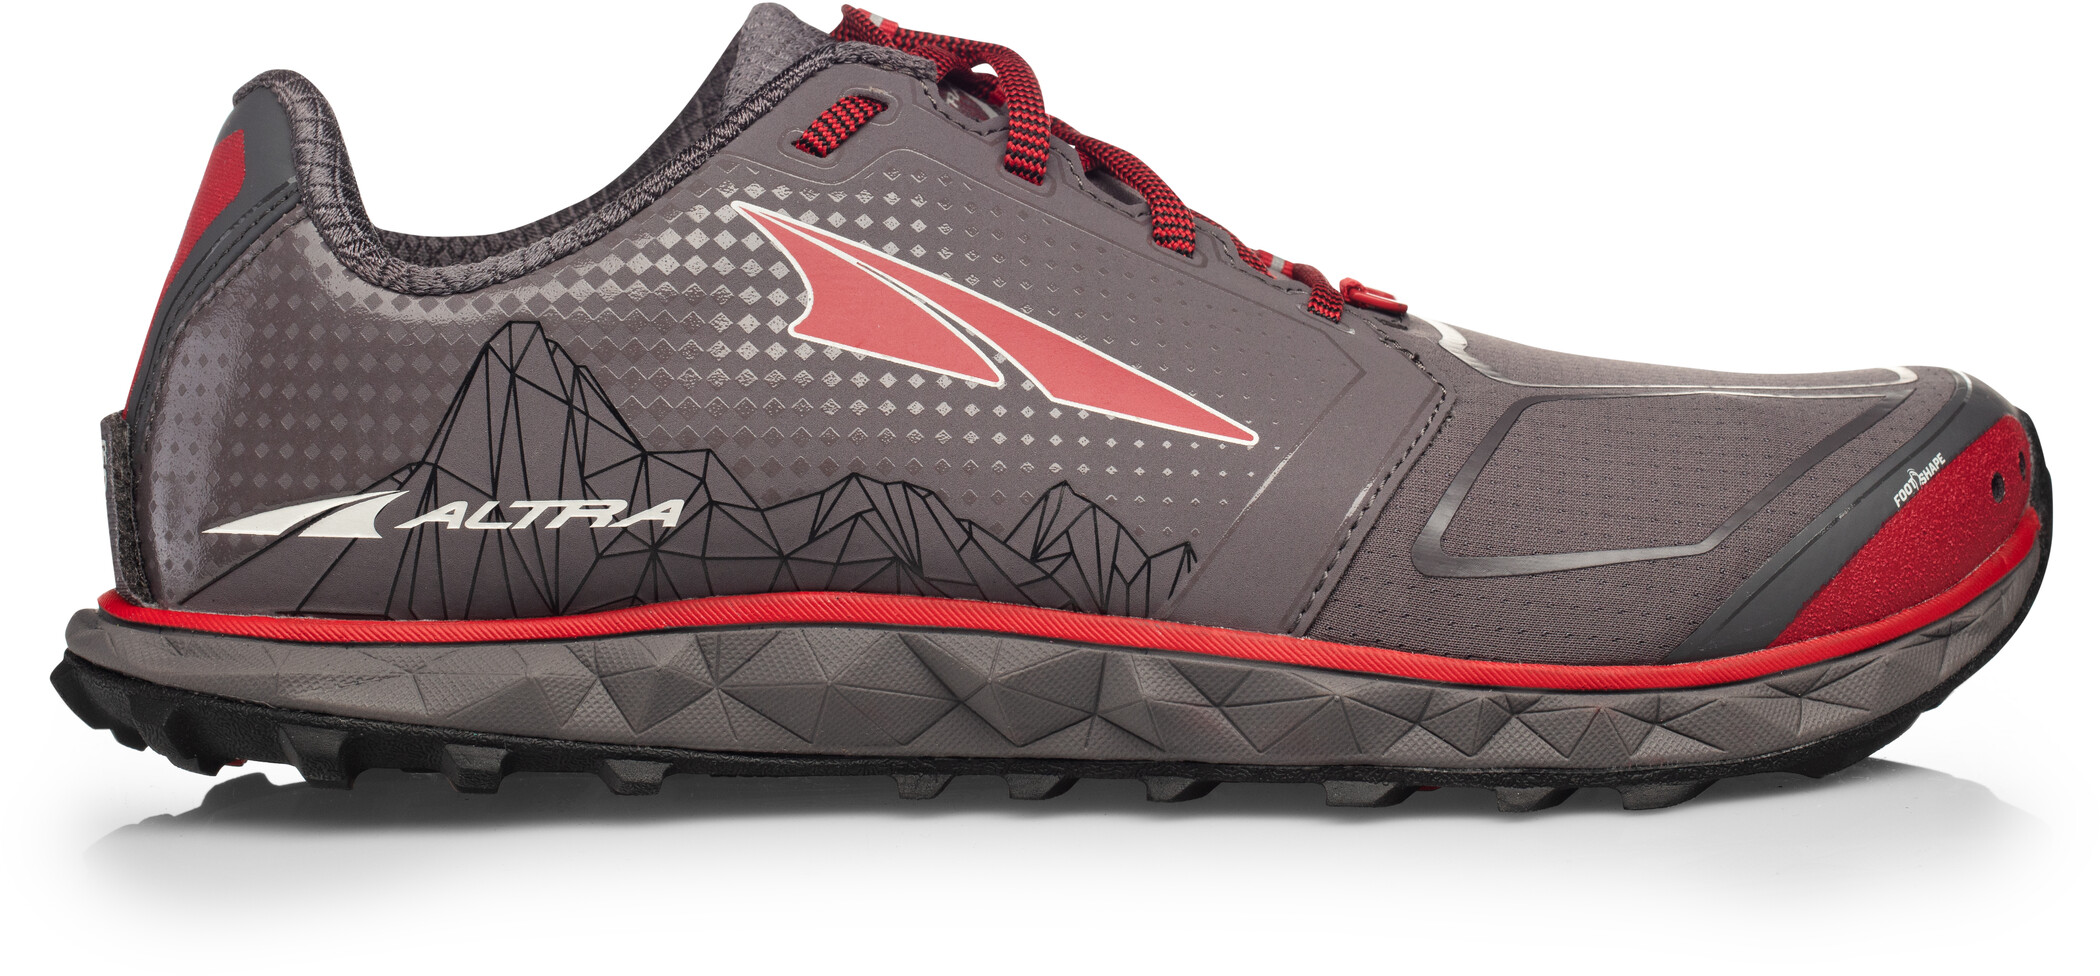 Altra Superior 4 Løbesko Herrer, gray/red (2019) | Running shoes